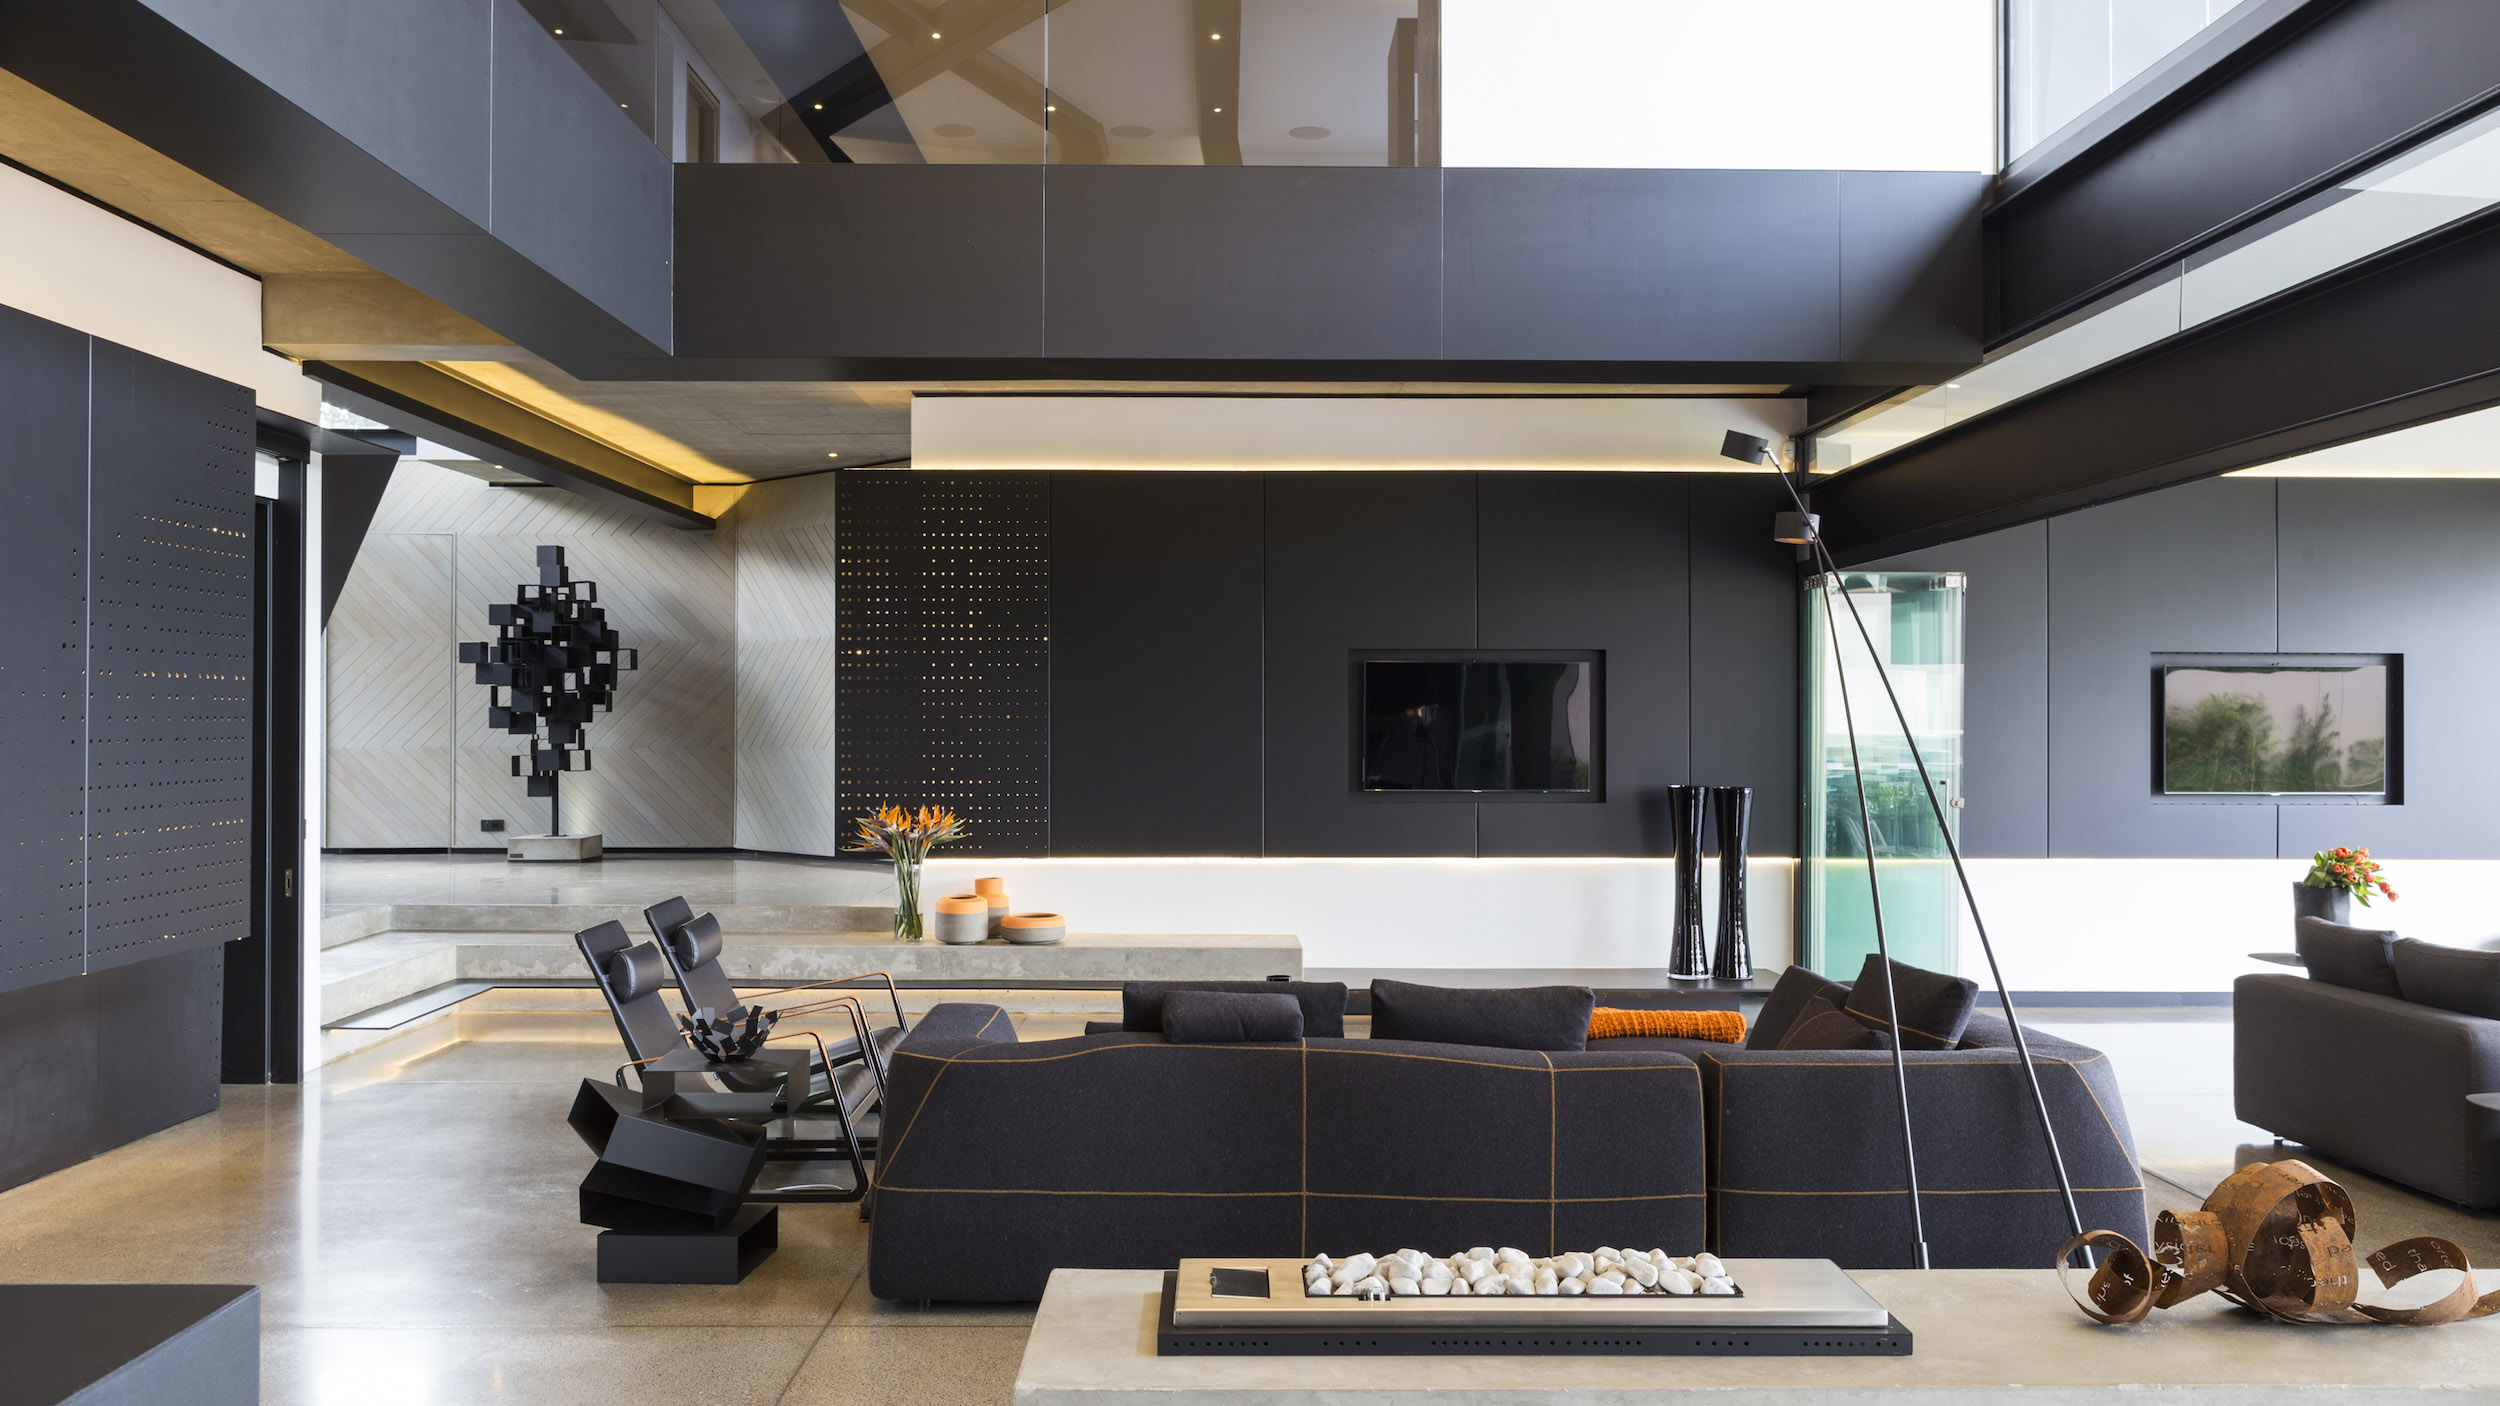 Kloof Road Masterpiece House in Johannesburg by Nico van der Meulen Architects-15